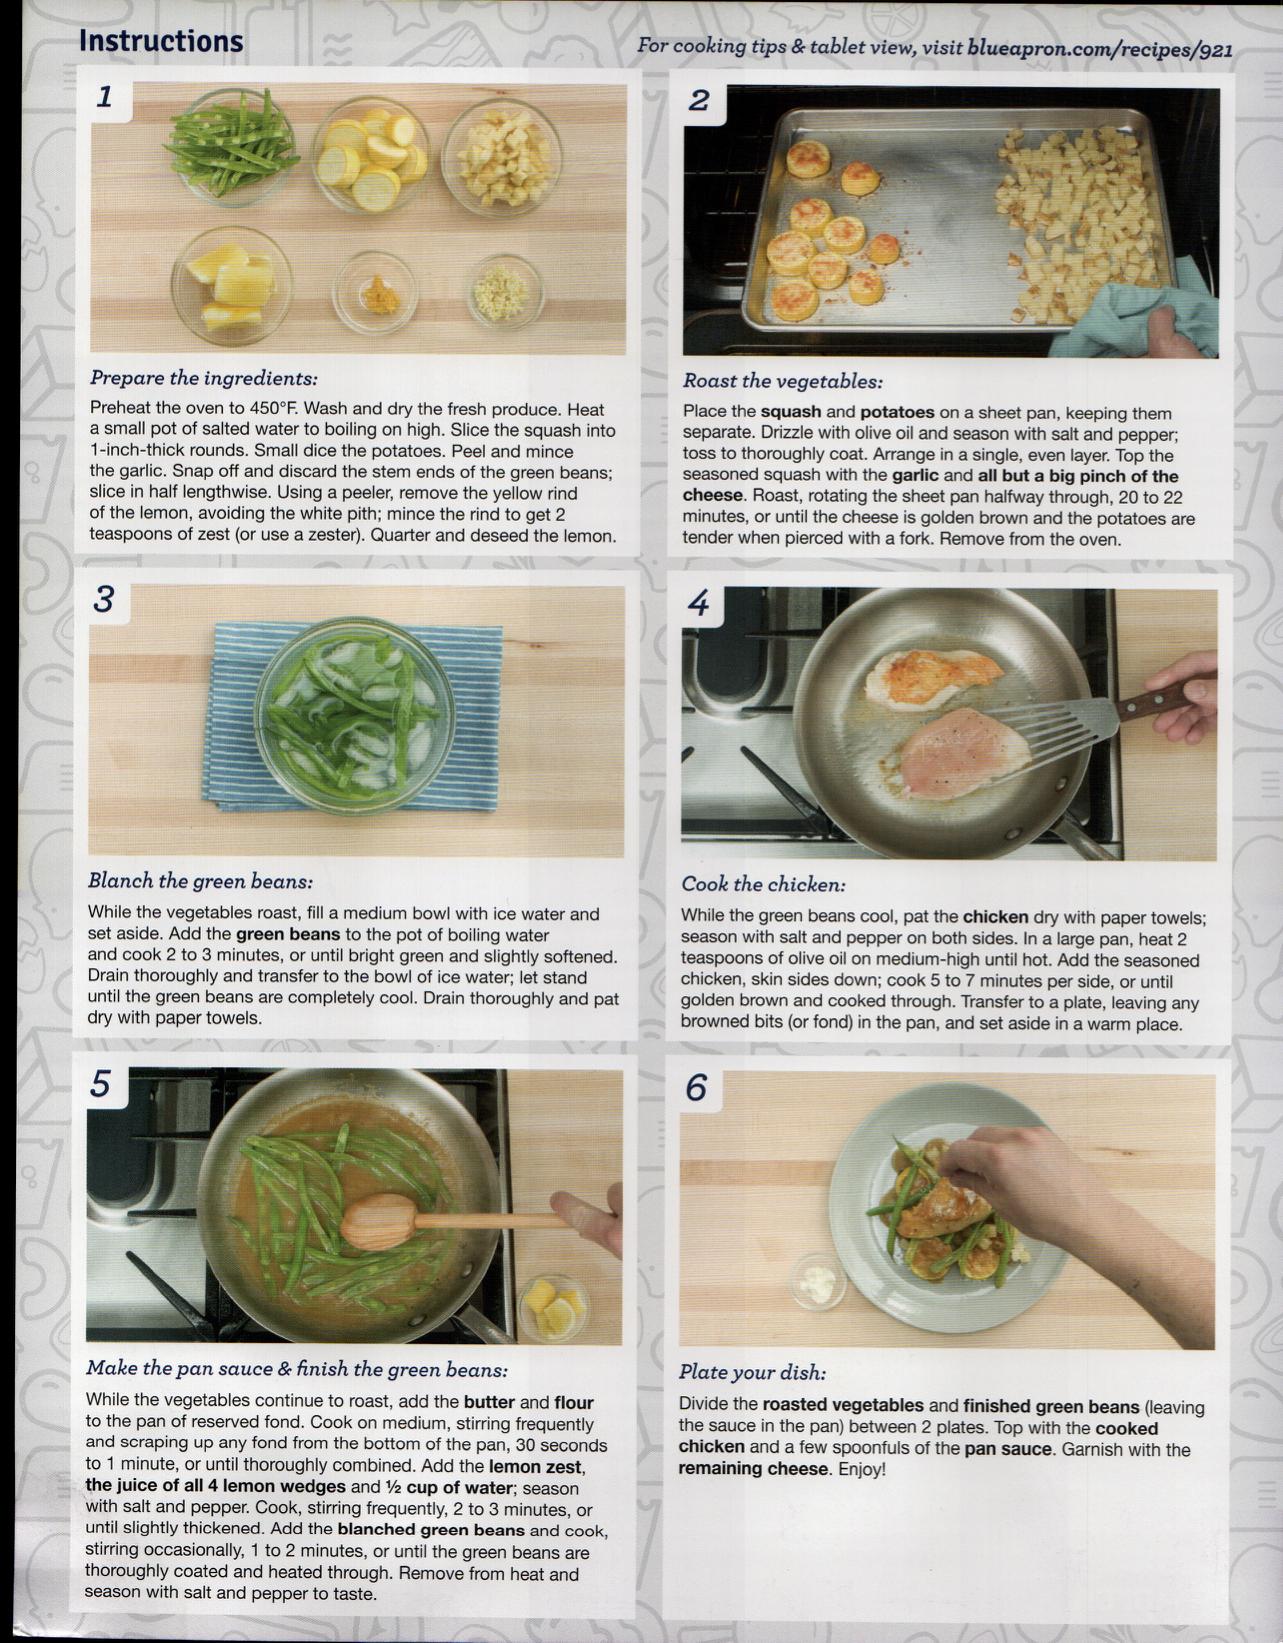 Blue apron yellow squash - Blue Apron Blueapron Cooking With Adam Cookingwithadam Green Beans Home Cooking Lemon Chicke Parmesan Potatoes Summer Squash